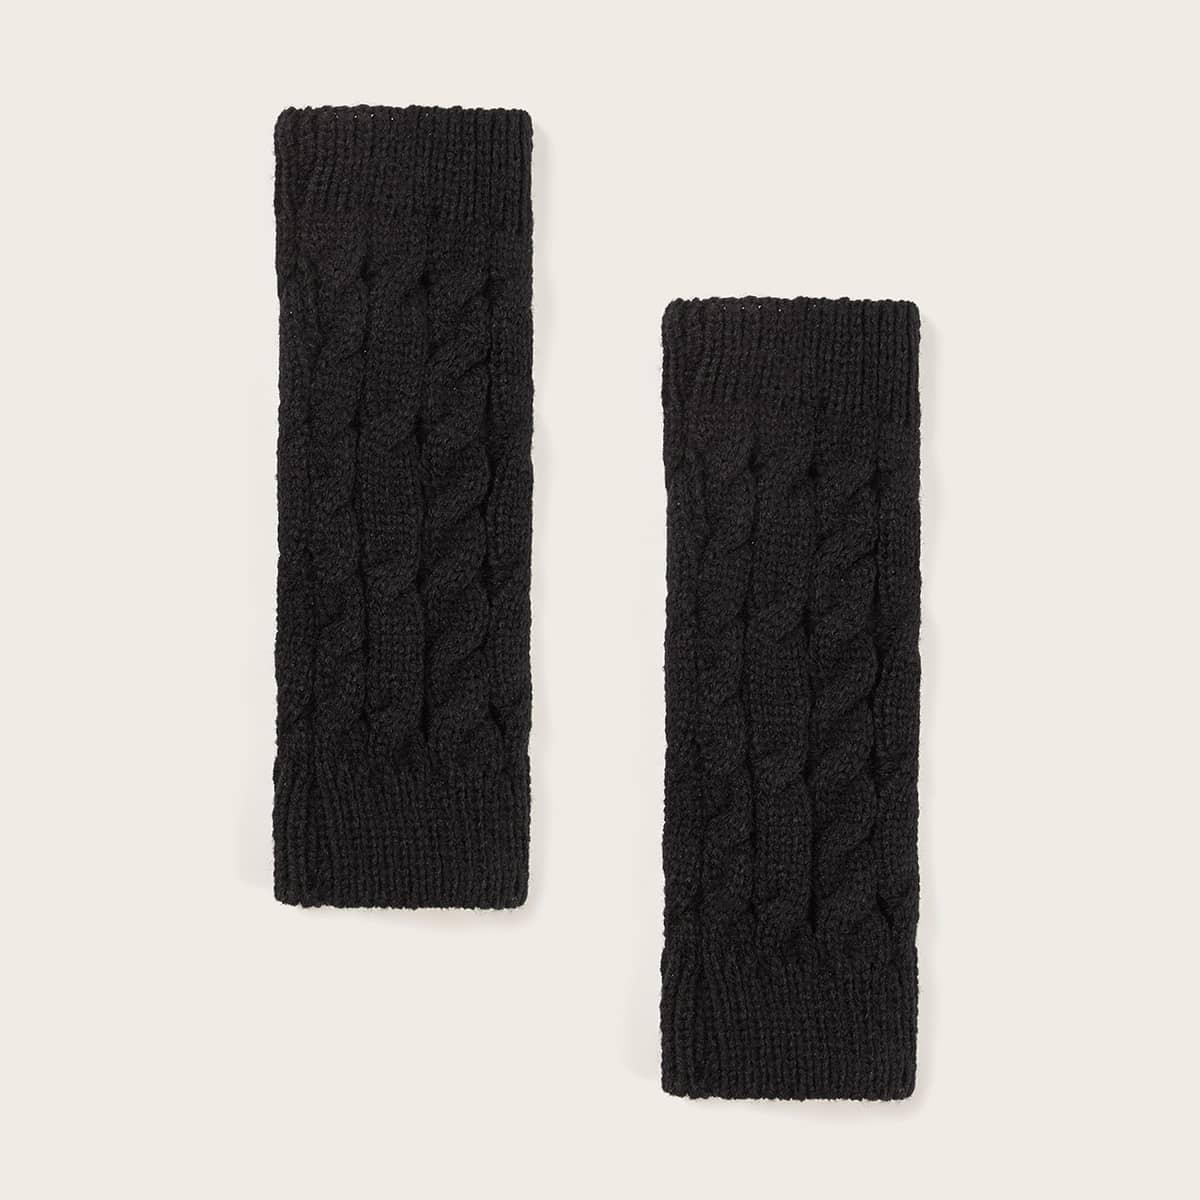 Вязаные перчатки с открытыми пальцами 1 пара от SHEIN